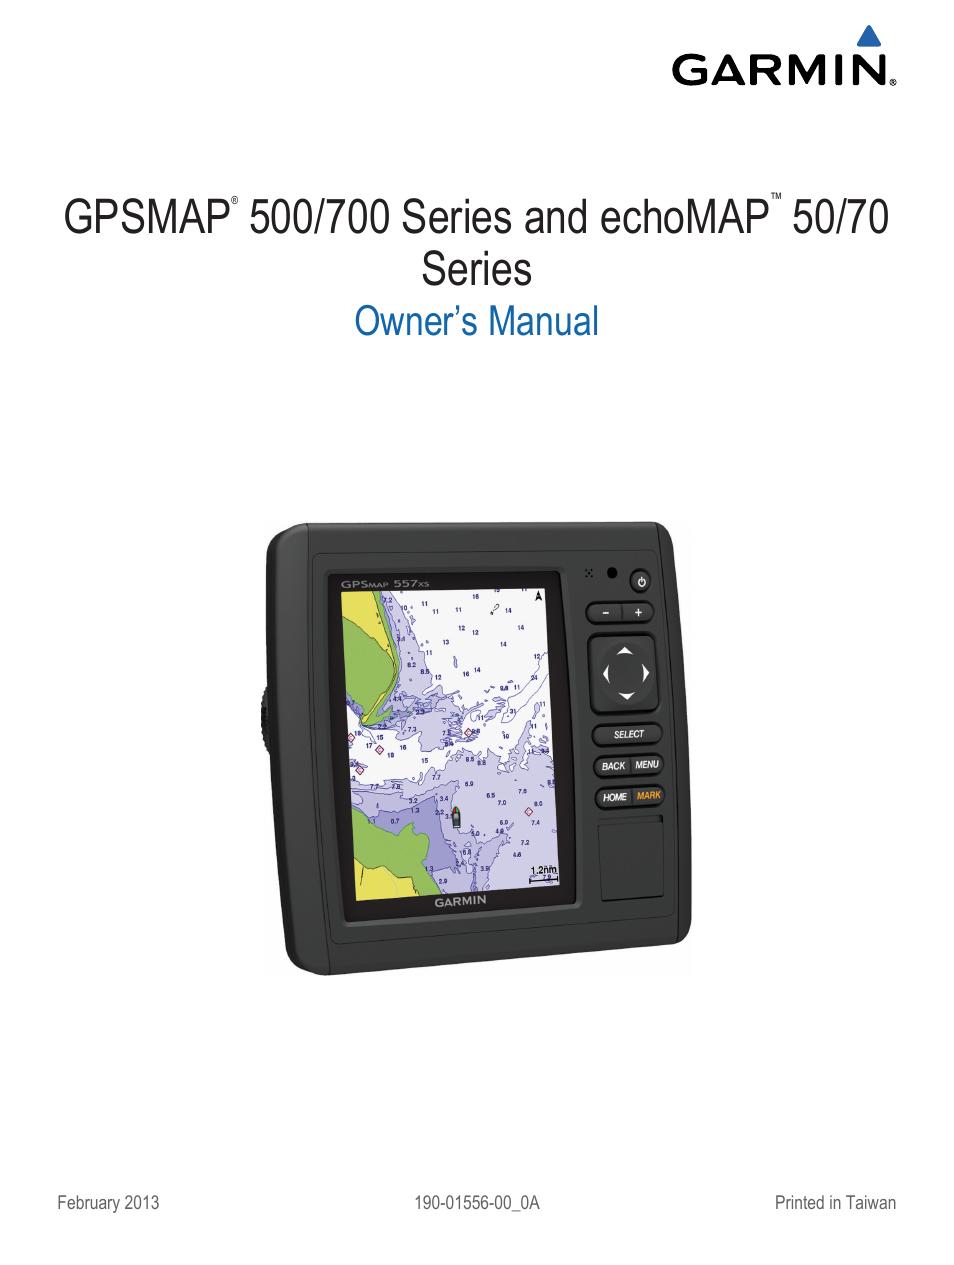 garmin gpsmap 751xs user manual 38 pages Garmin Auto GPS Manual garmin gps v manual español